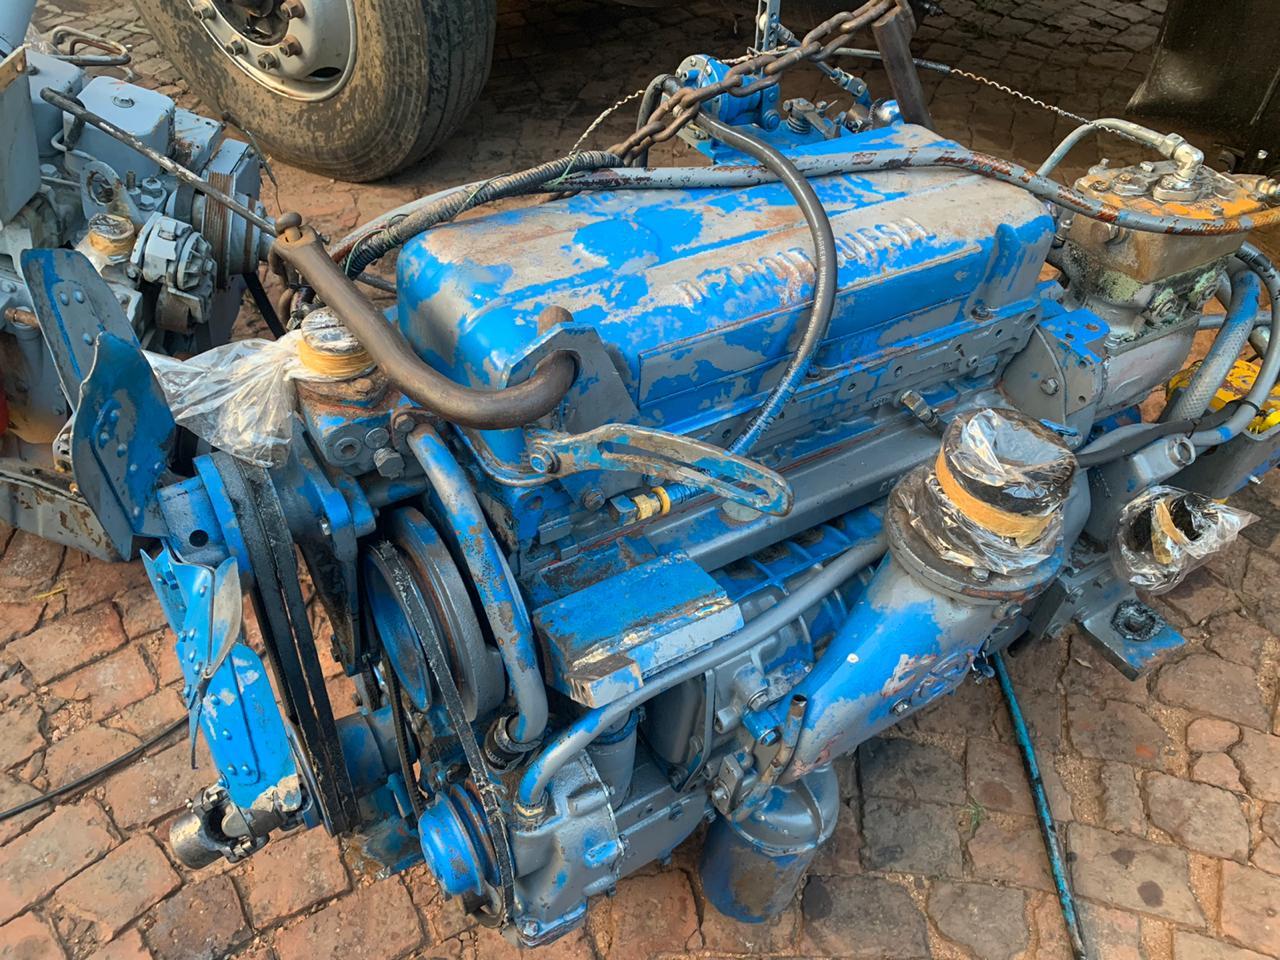 Detroit 453 2 stroke diesel engine